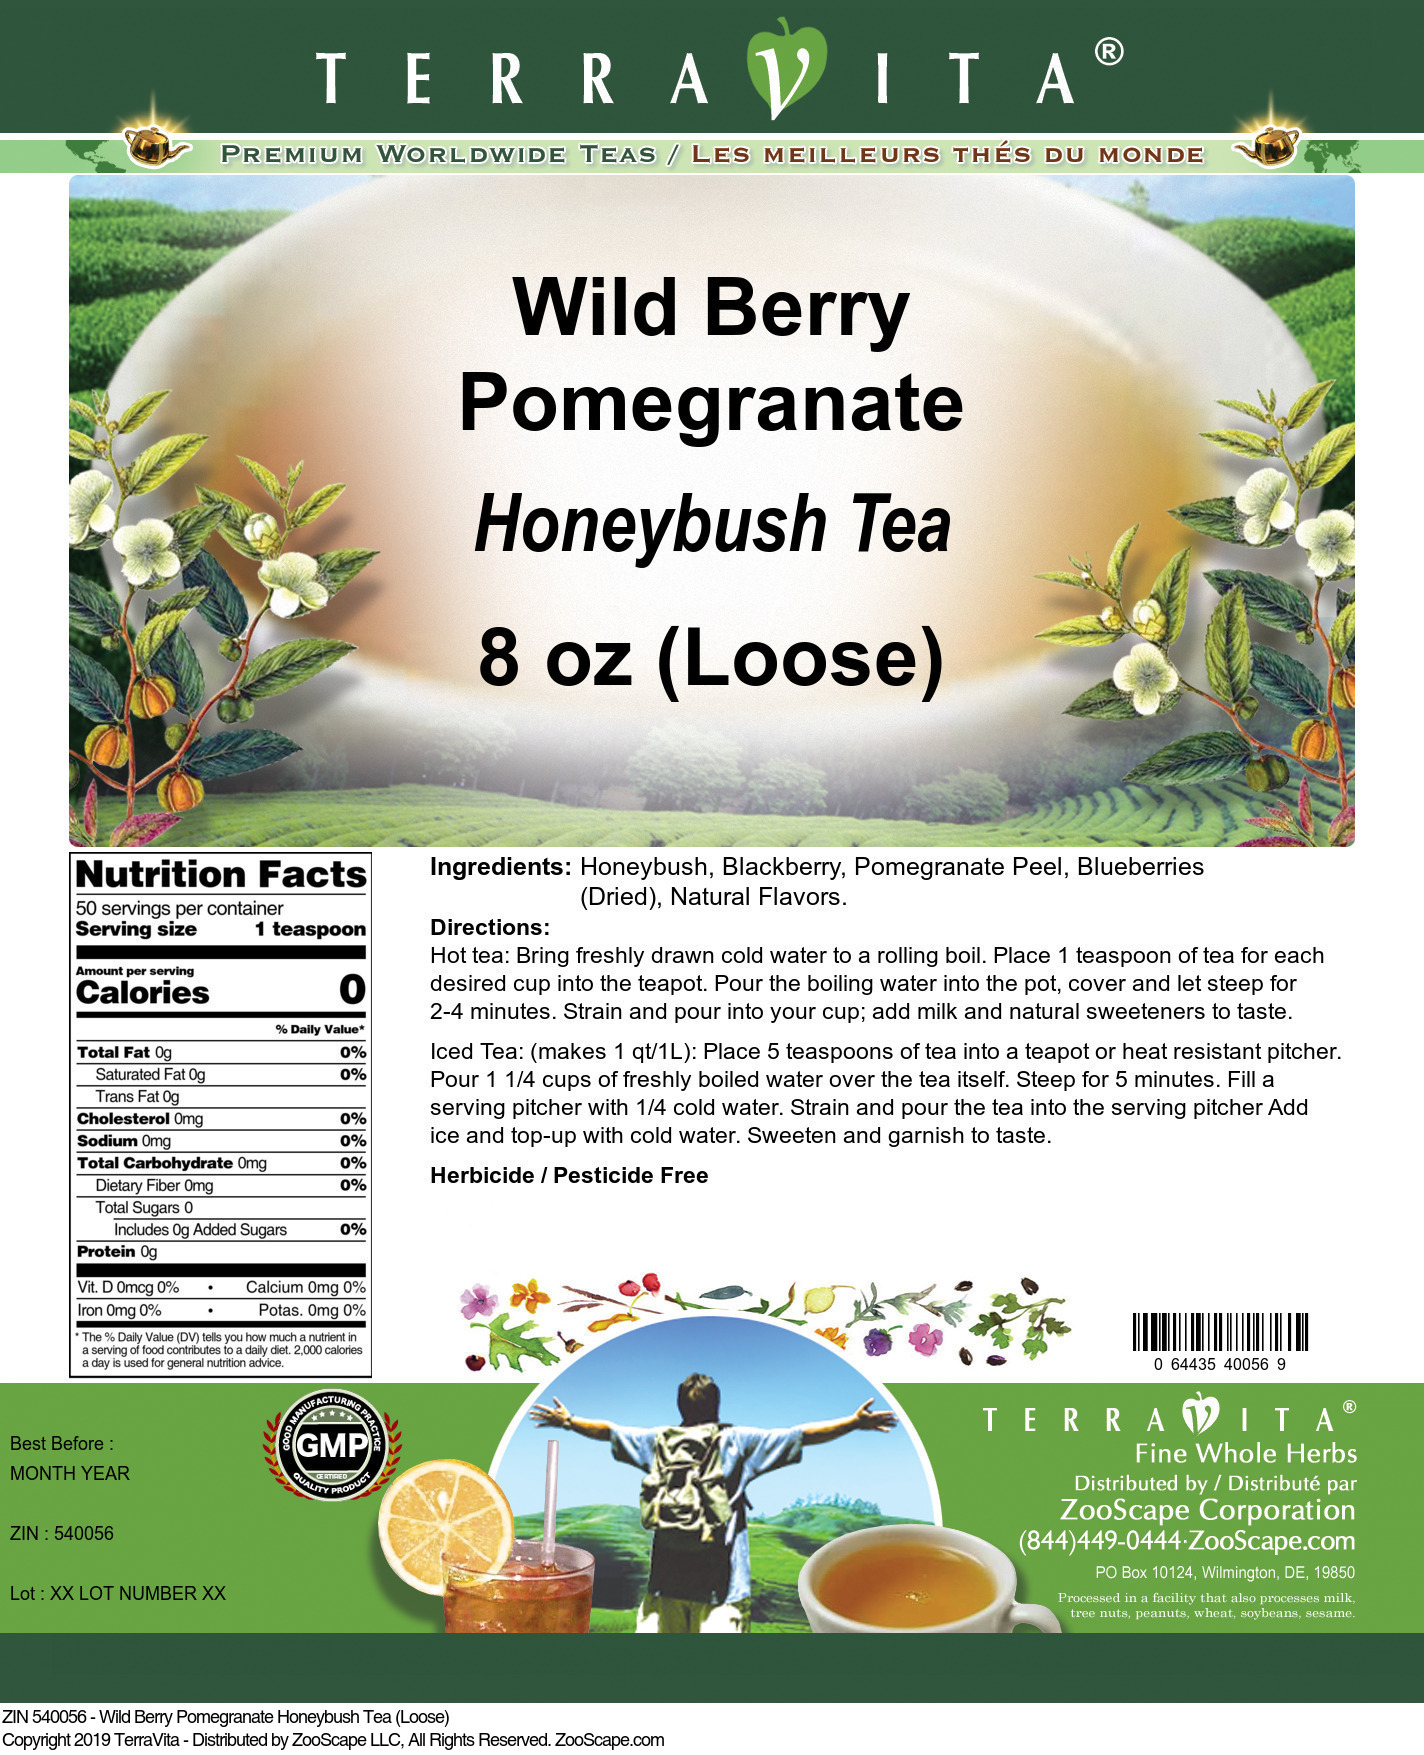 Wild Berry Pomegranate Honeybush Tea